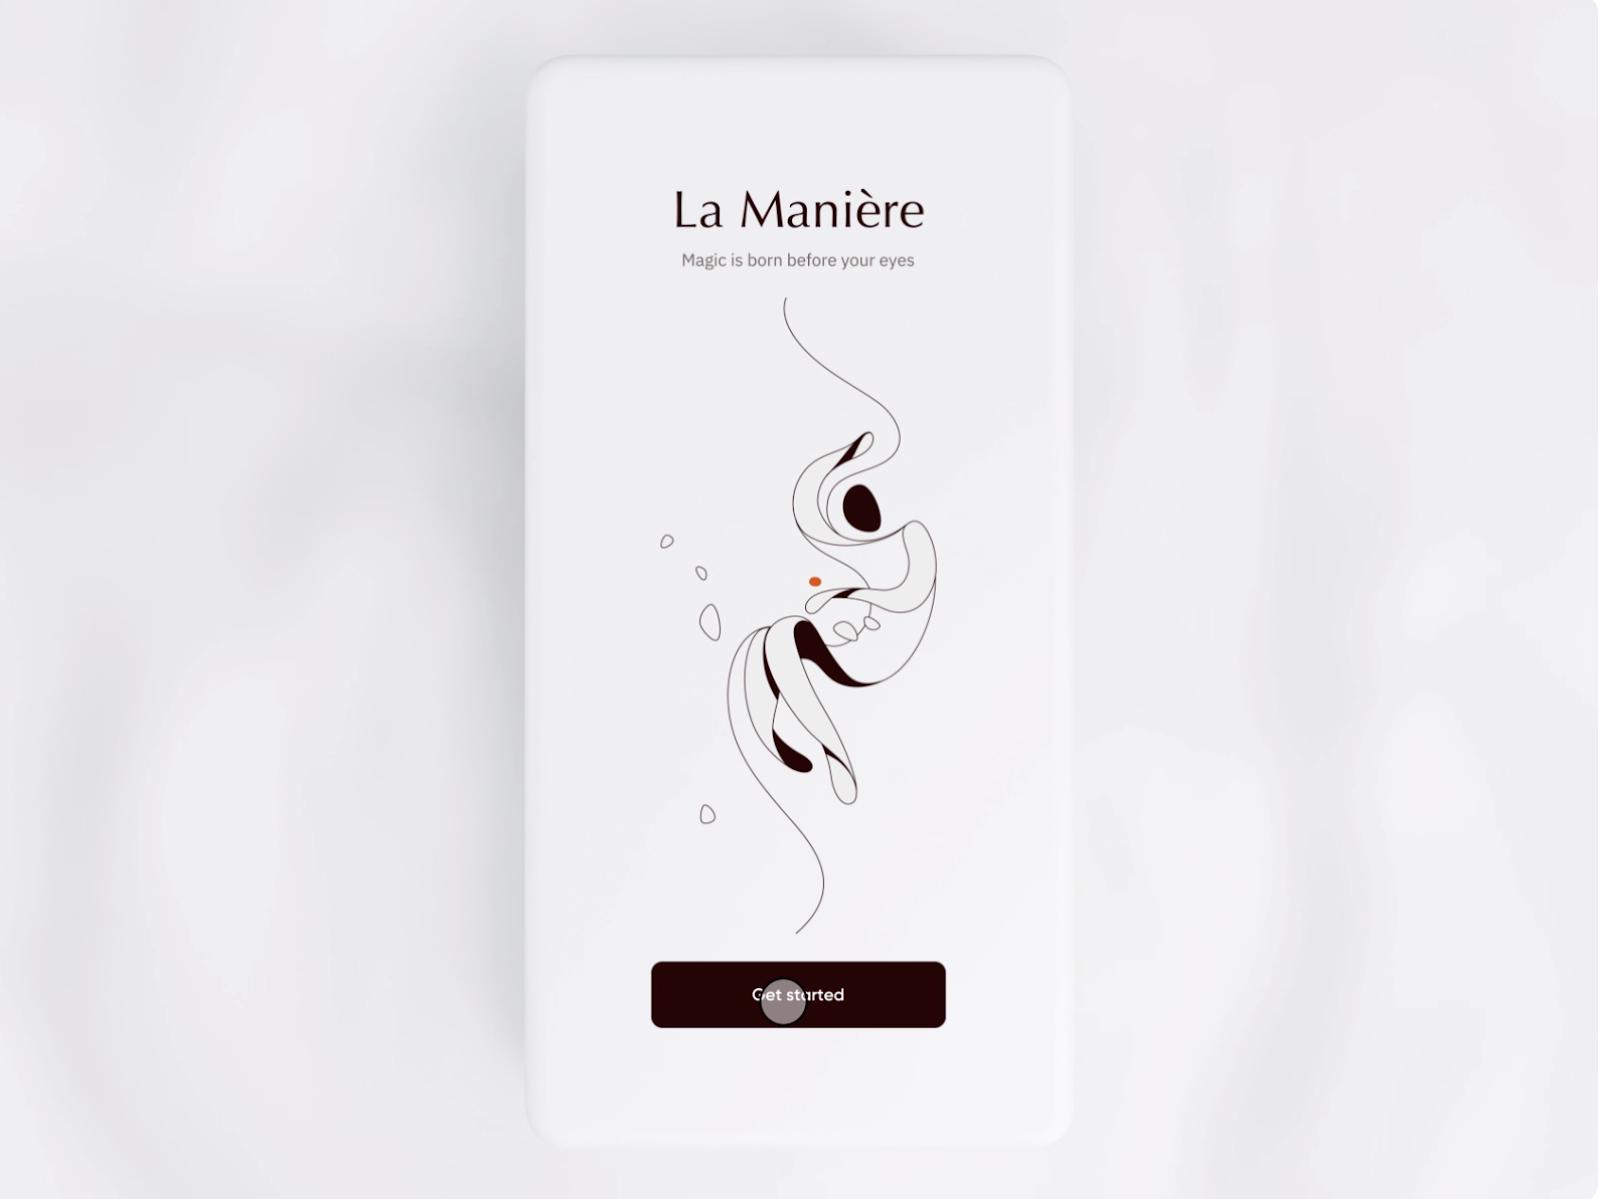 Illustration in App Design